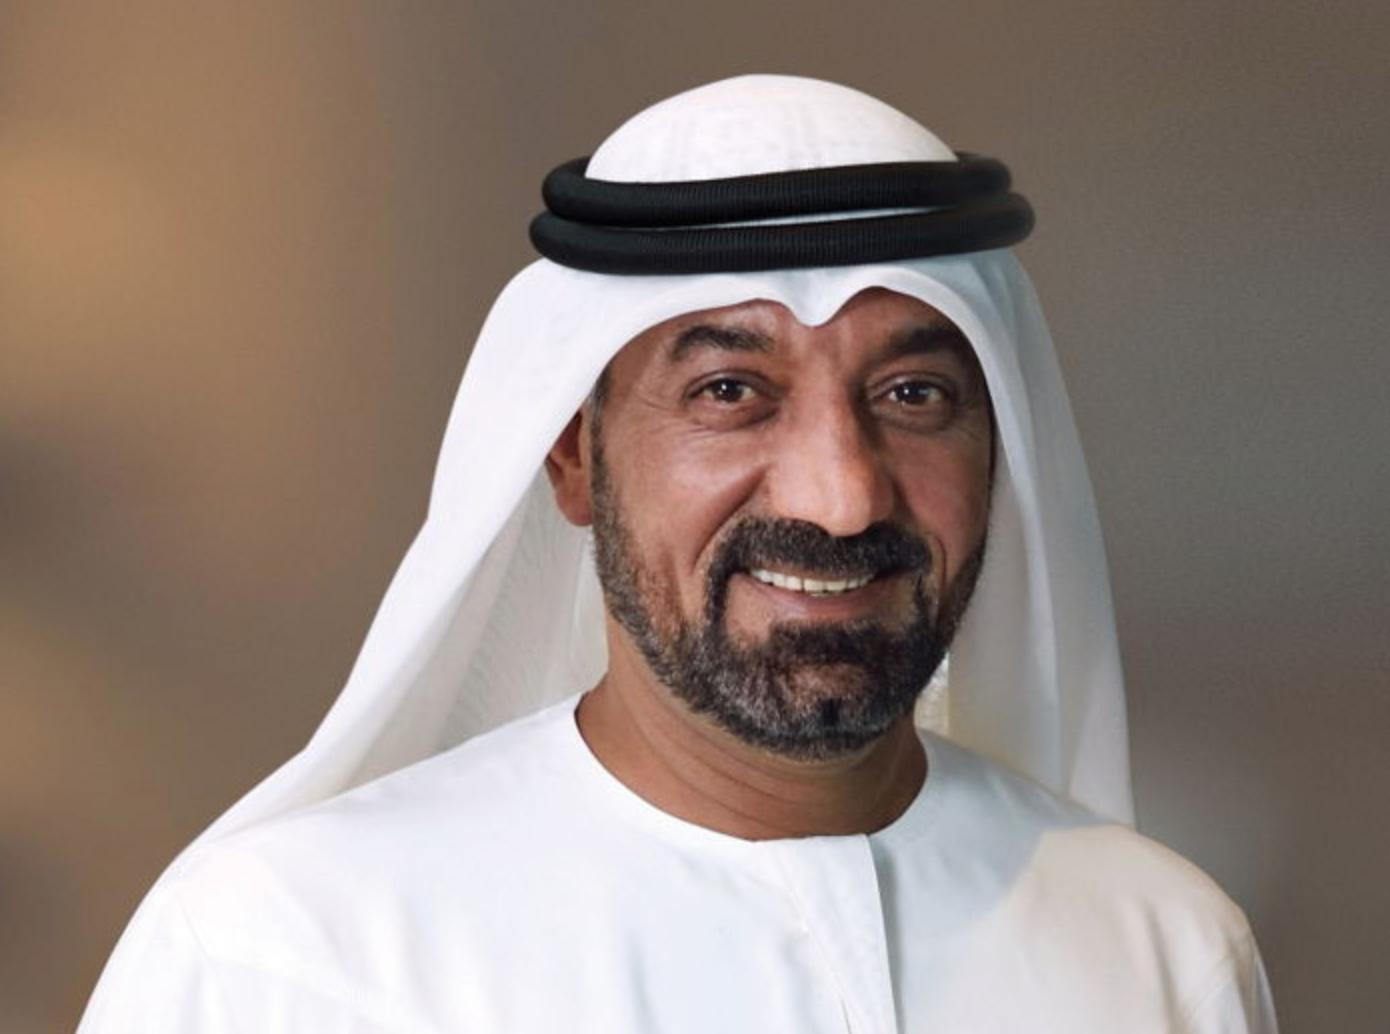 Předseda a výkonný ředitel Emirates Ahmed bin Saeed Al Maktoum